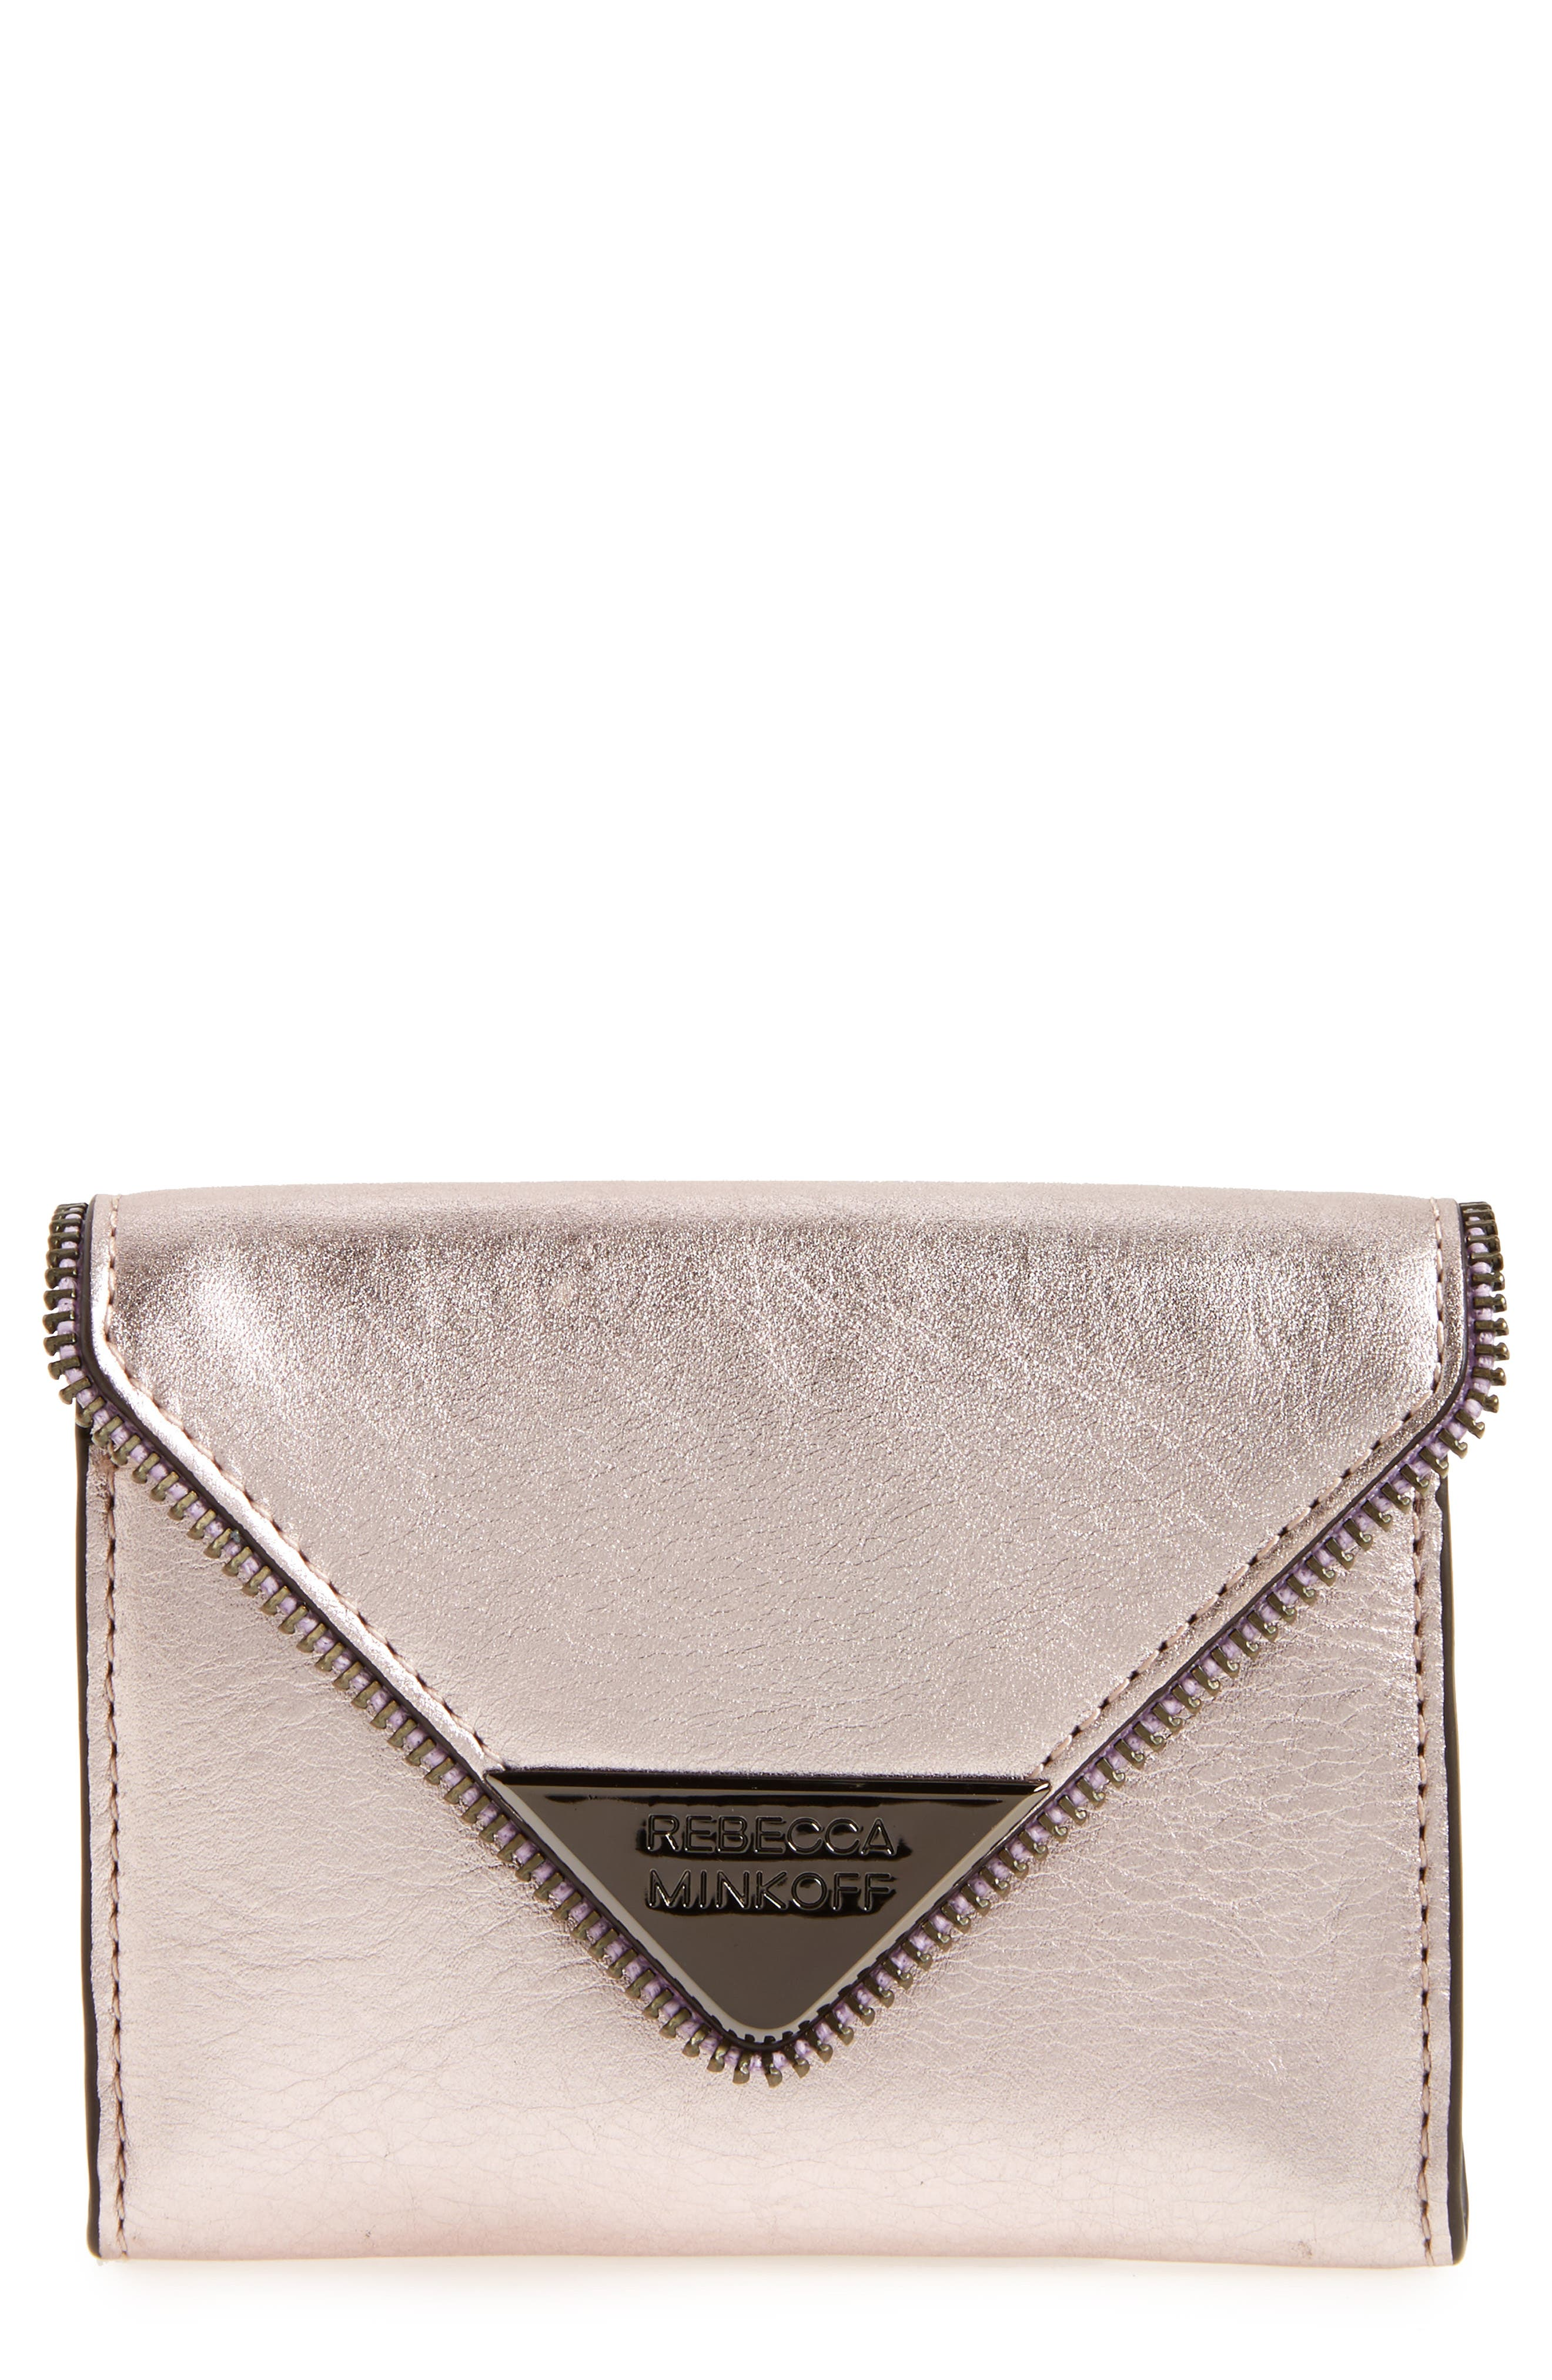 Main Image - Rebecca Minkoff Molly Metro Metallic Leather Wallet